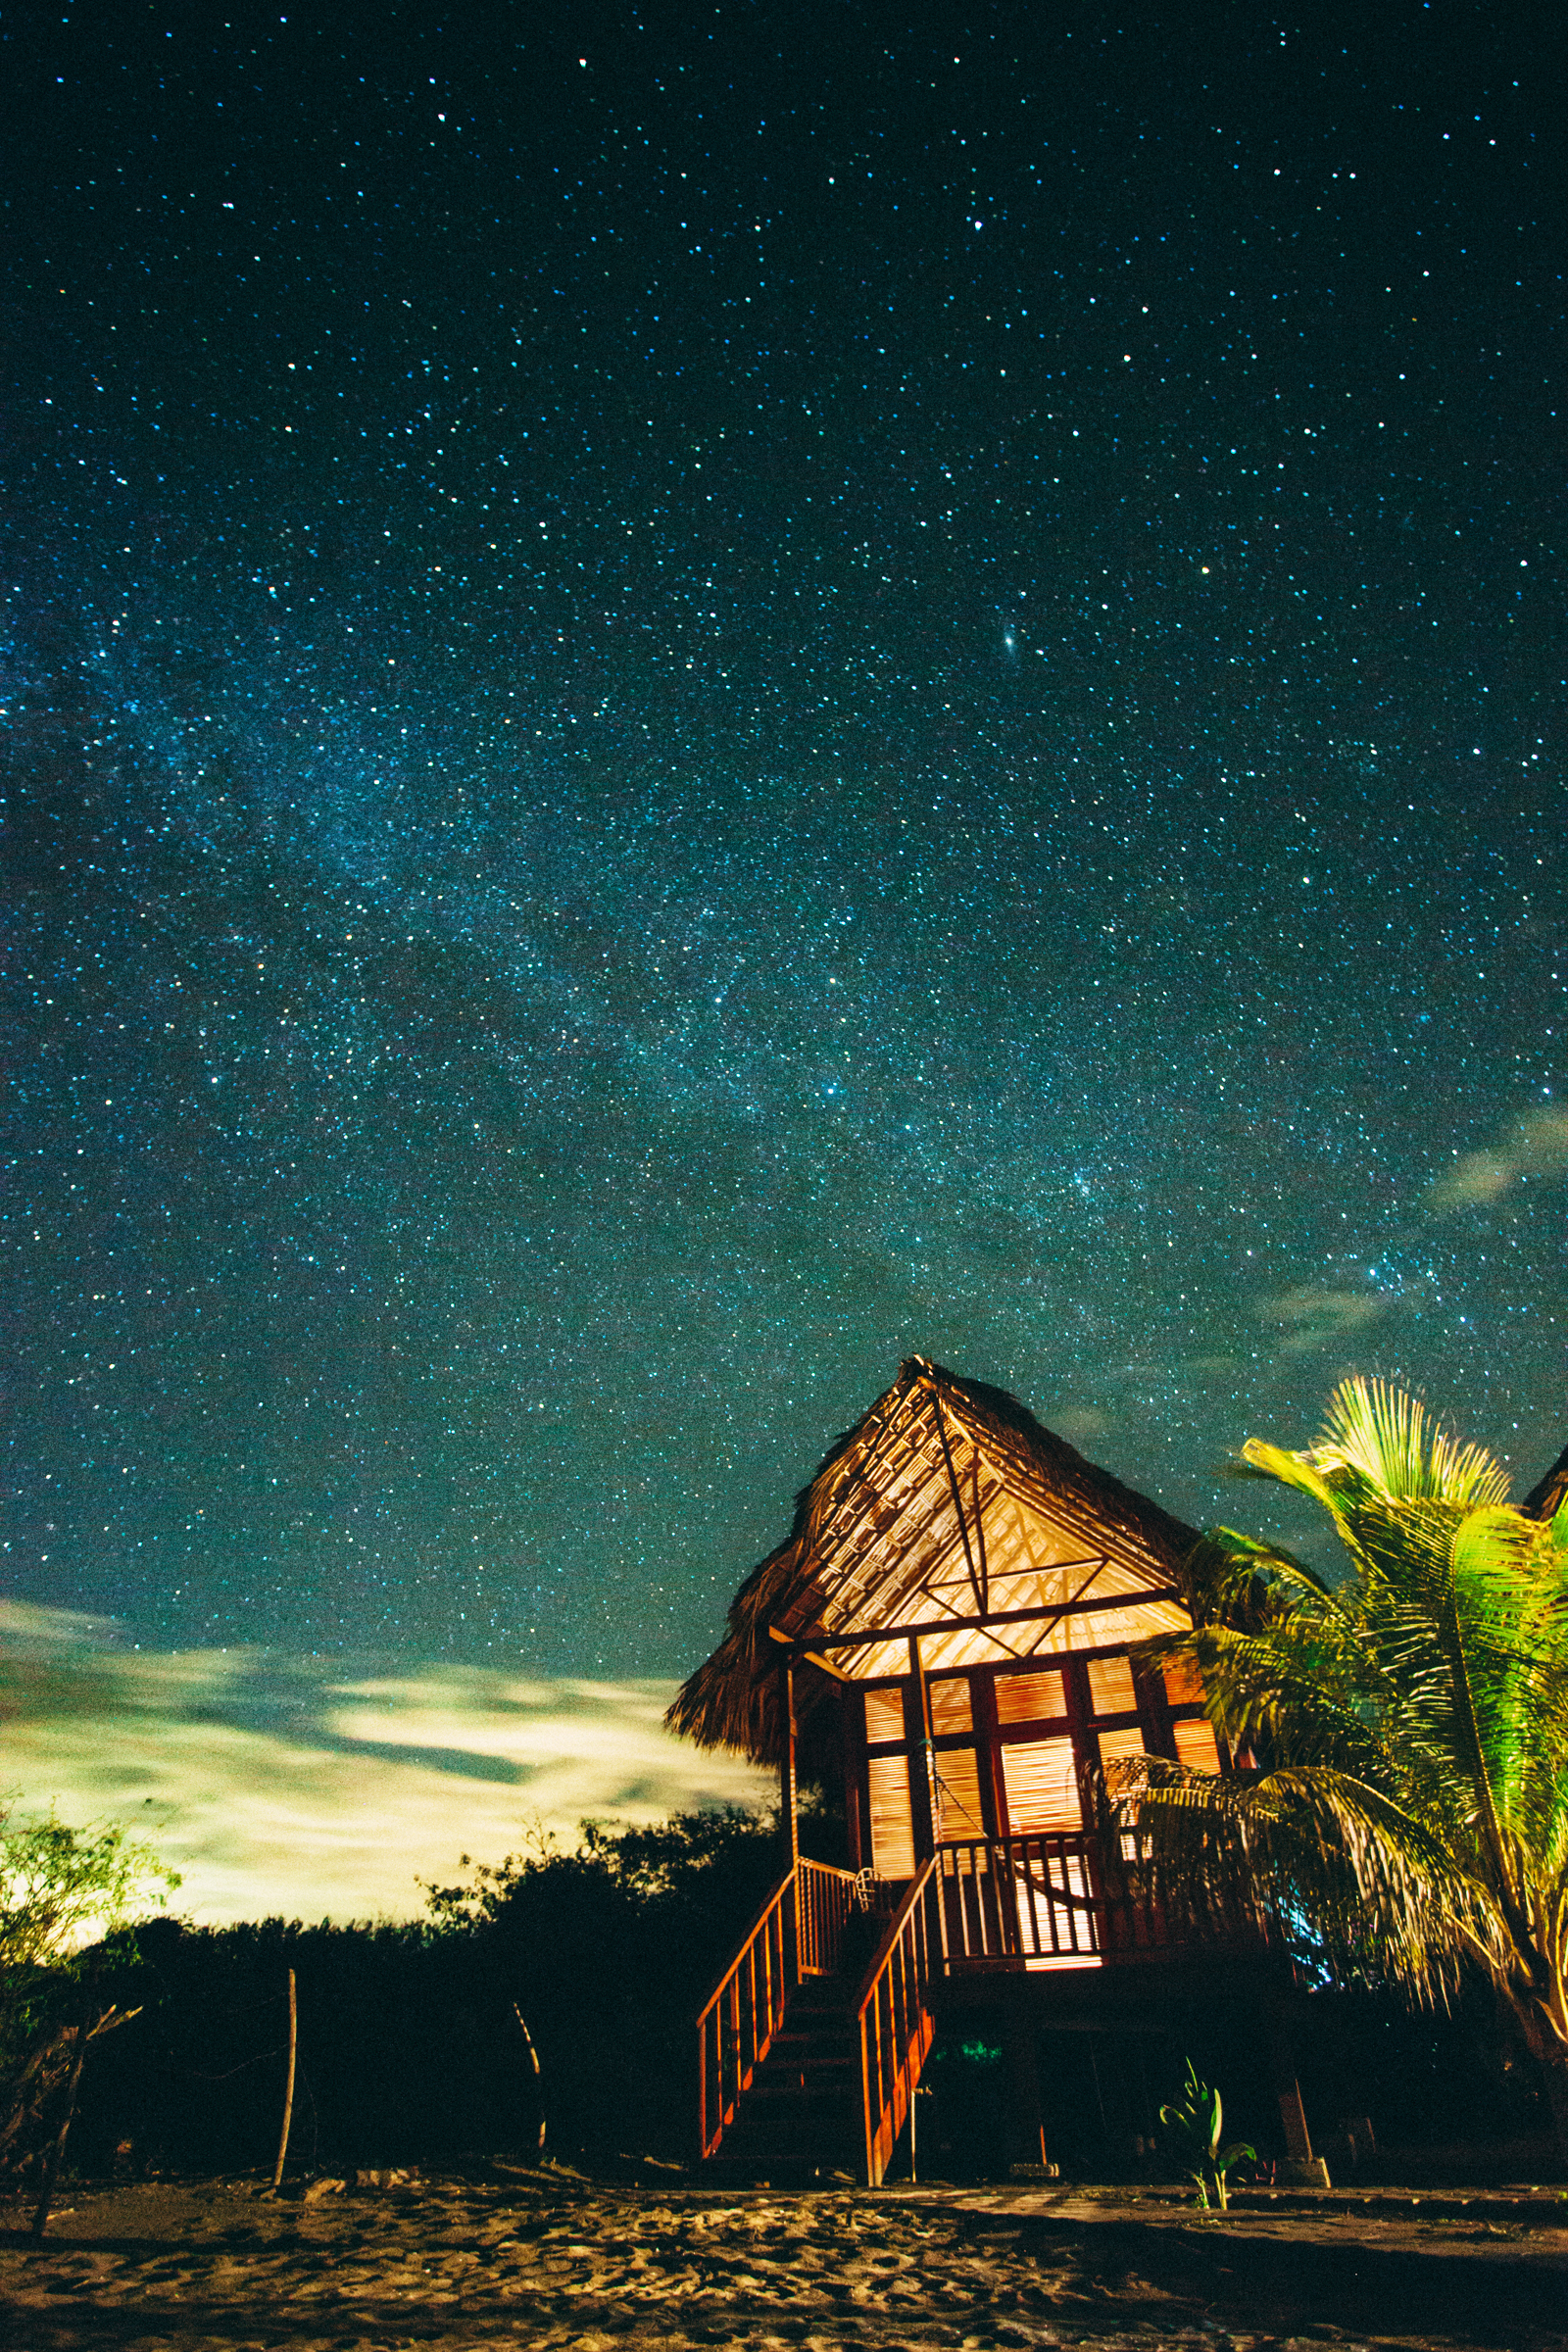 nicaragua night beach